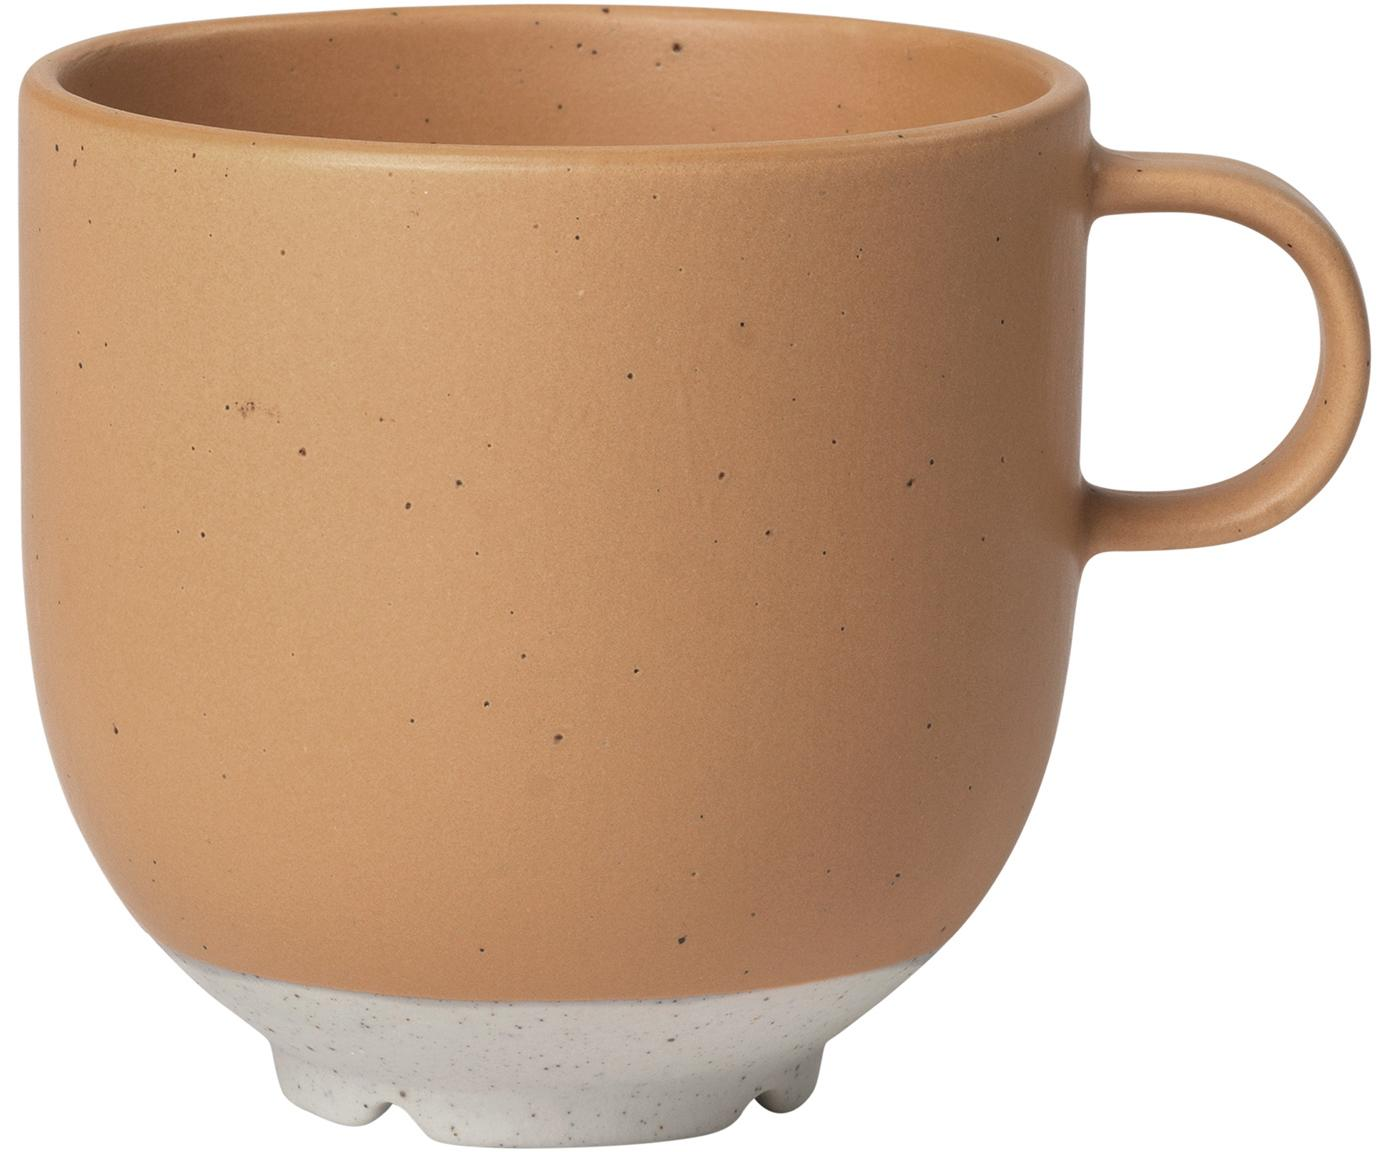 Tazza in terracotta con finitura opaca Eli 4 pz, Gres, Marrone chiaro, beige, Ø 8 x Alt. 8 cm